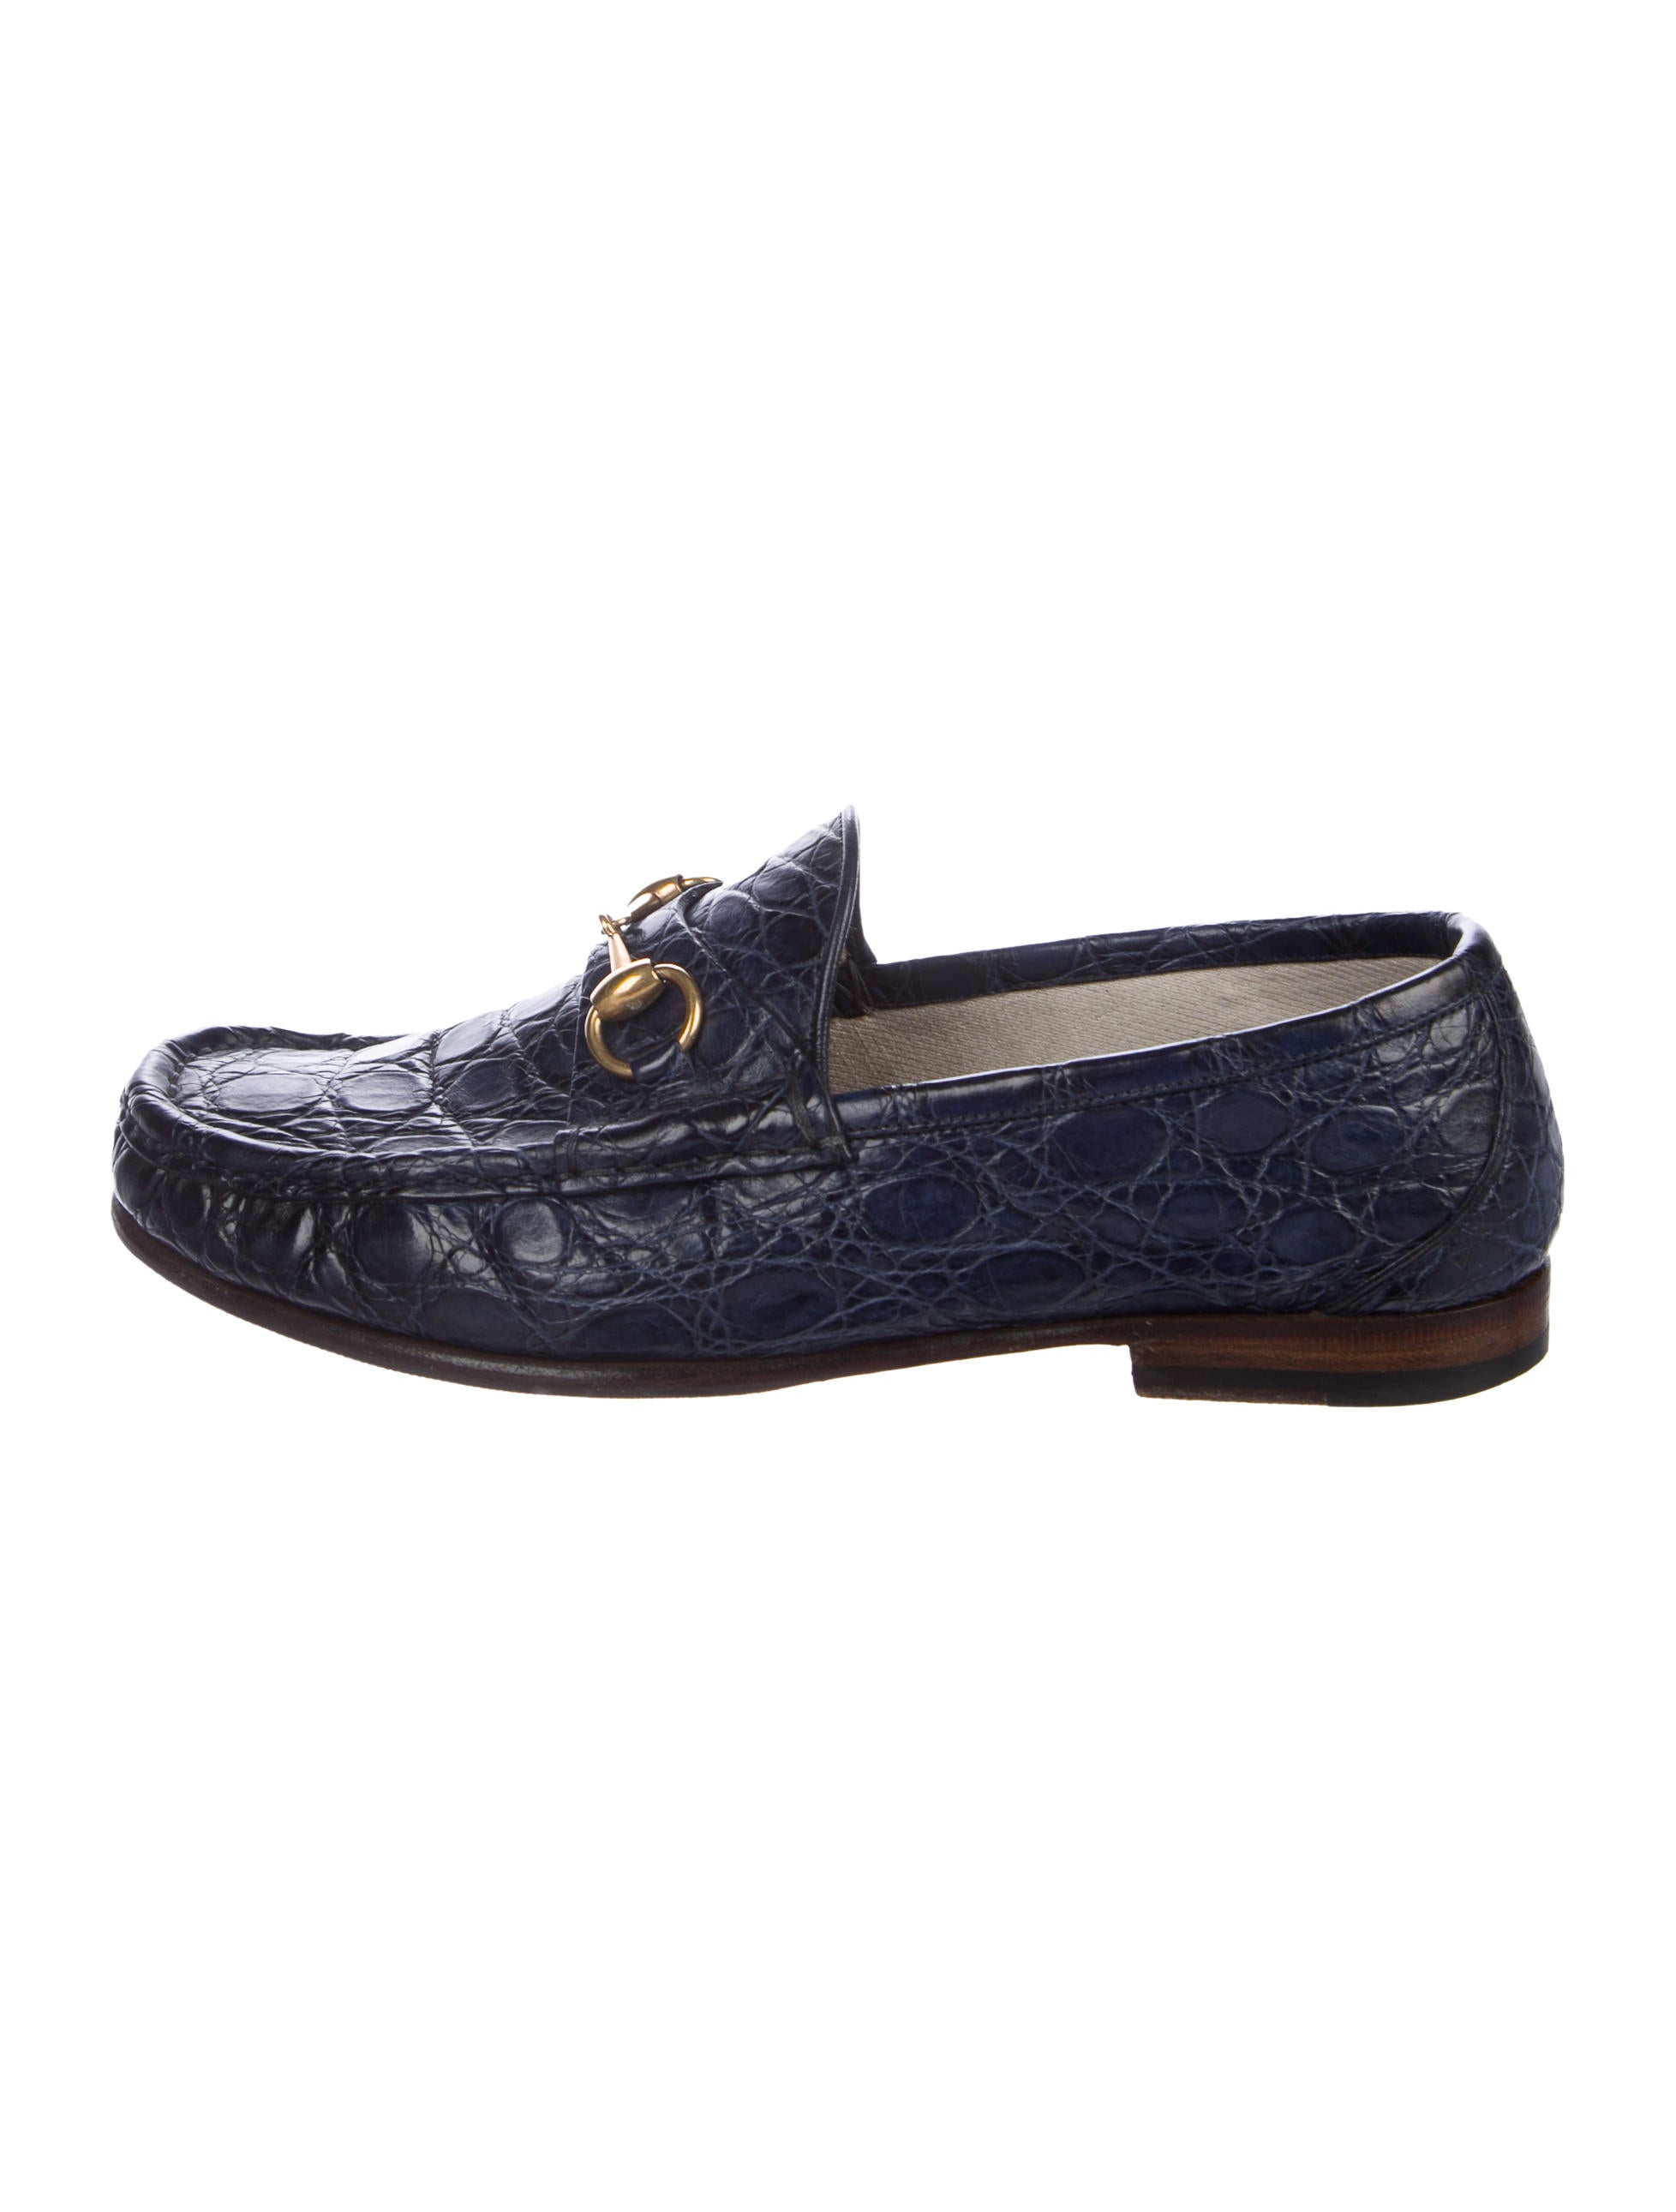 cef134ad9c2 Gucci 1953 Crocodile Horsebit Loafers - Shoes - GUC164866